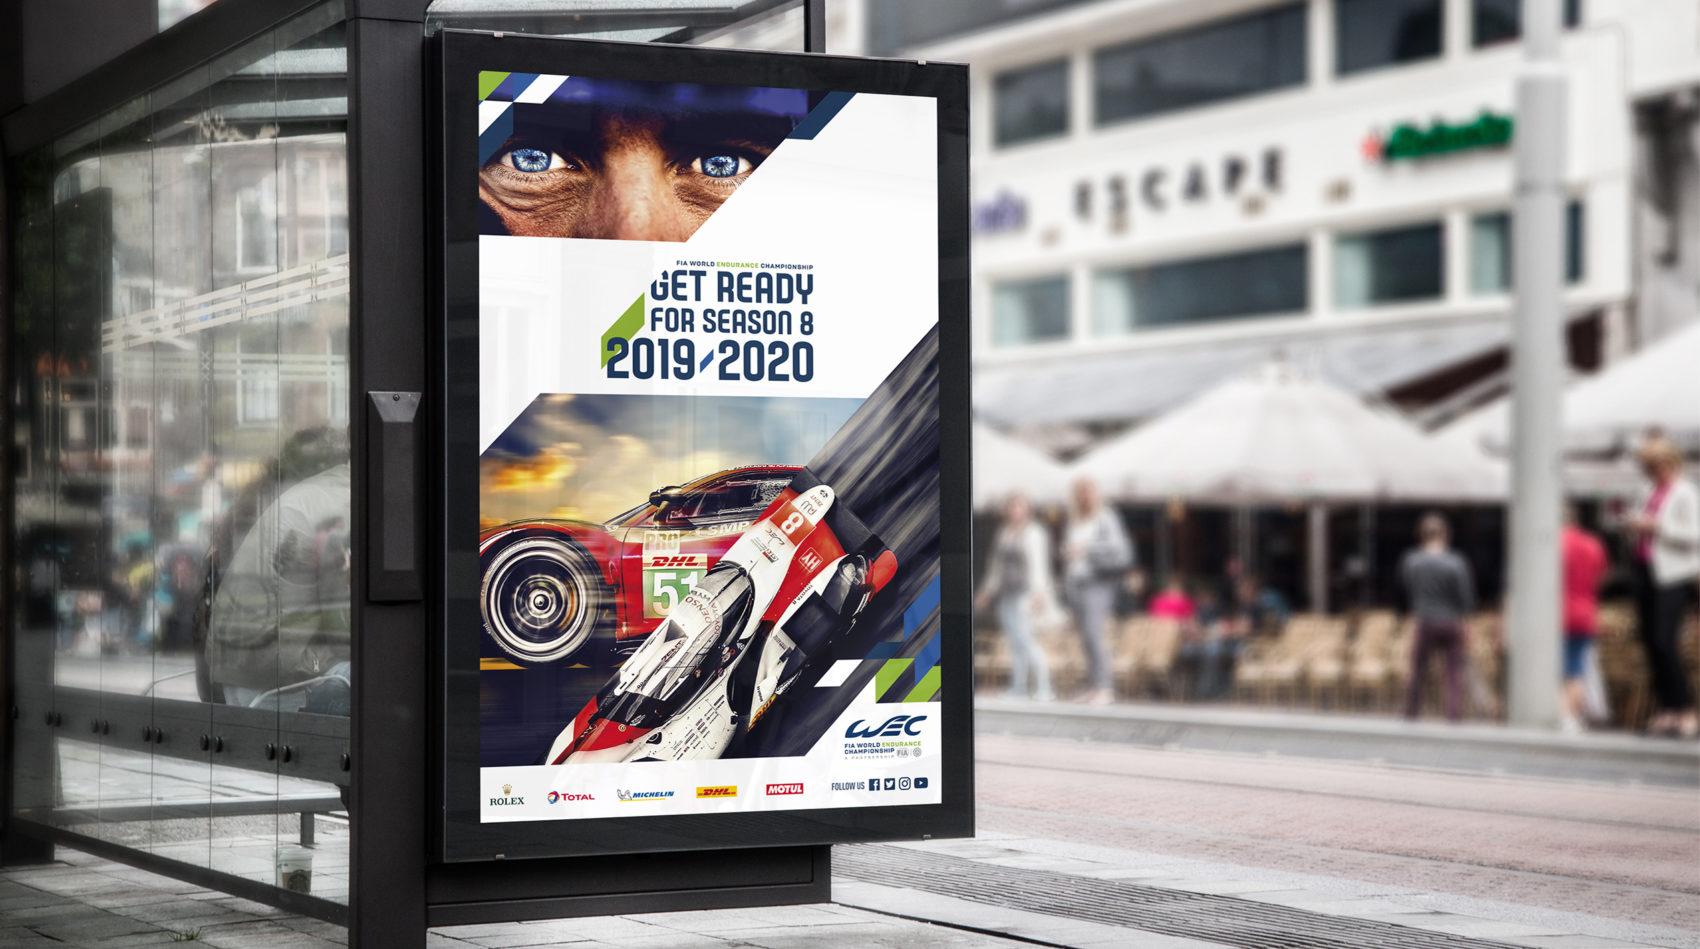 Projet_Project_WEC_FIA_world_endurance_championship_affichage_poster